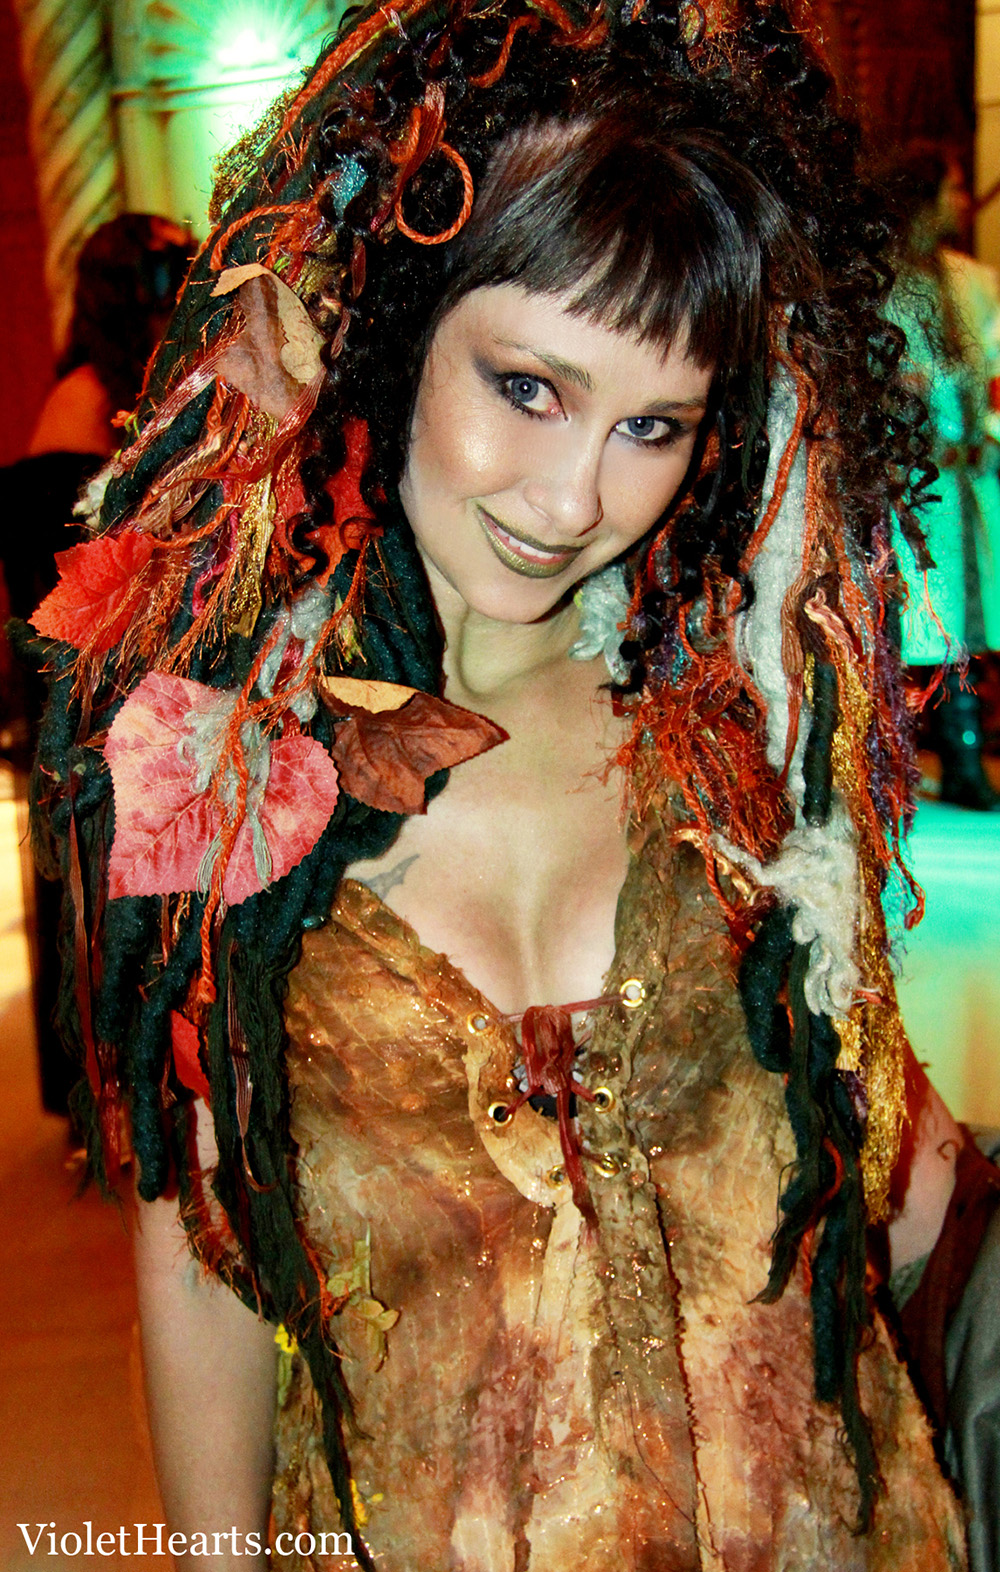 labyrinth_masquerade_201705040240